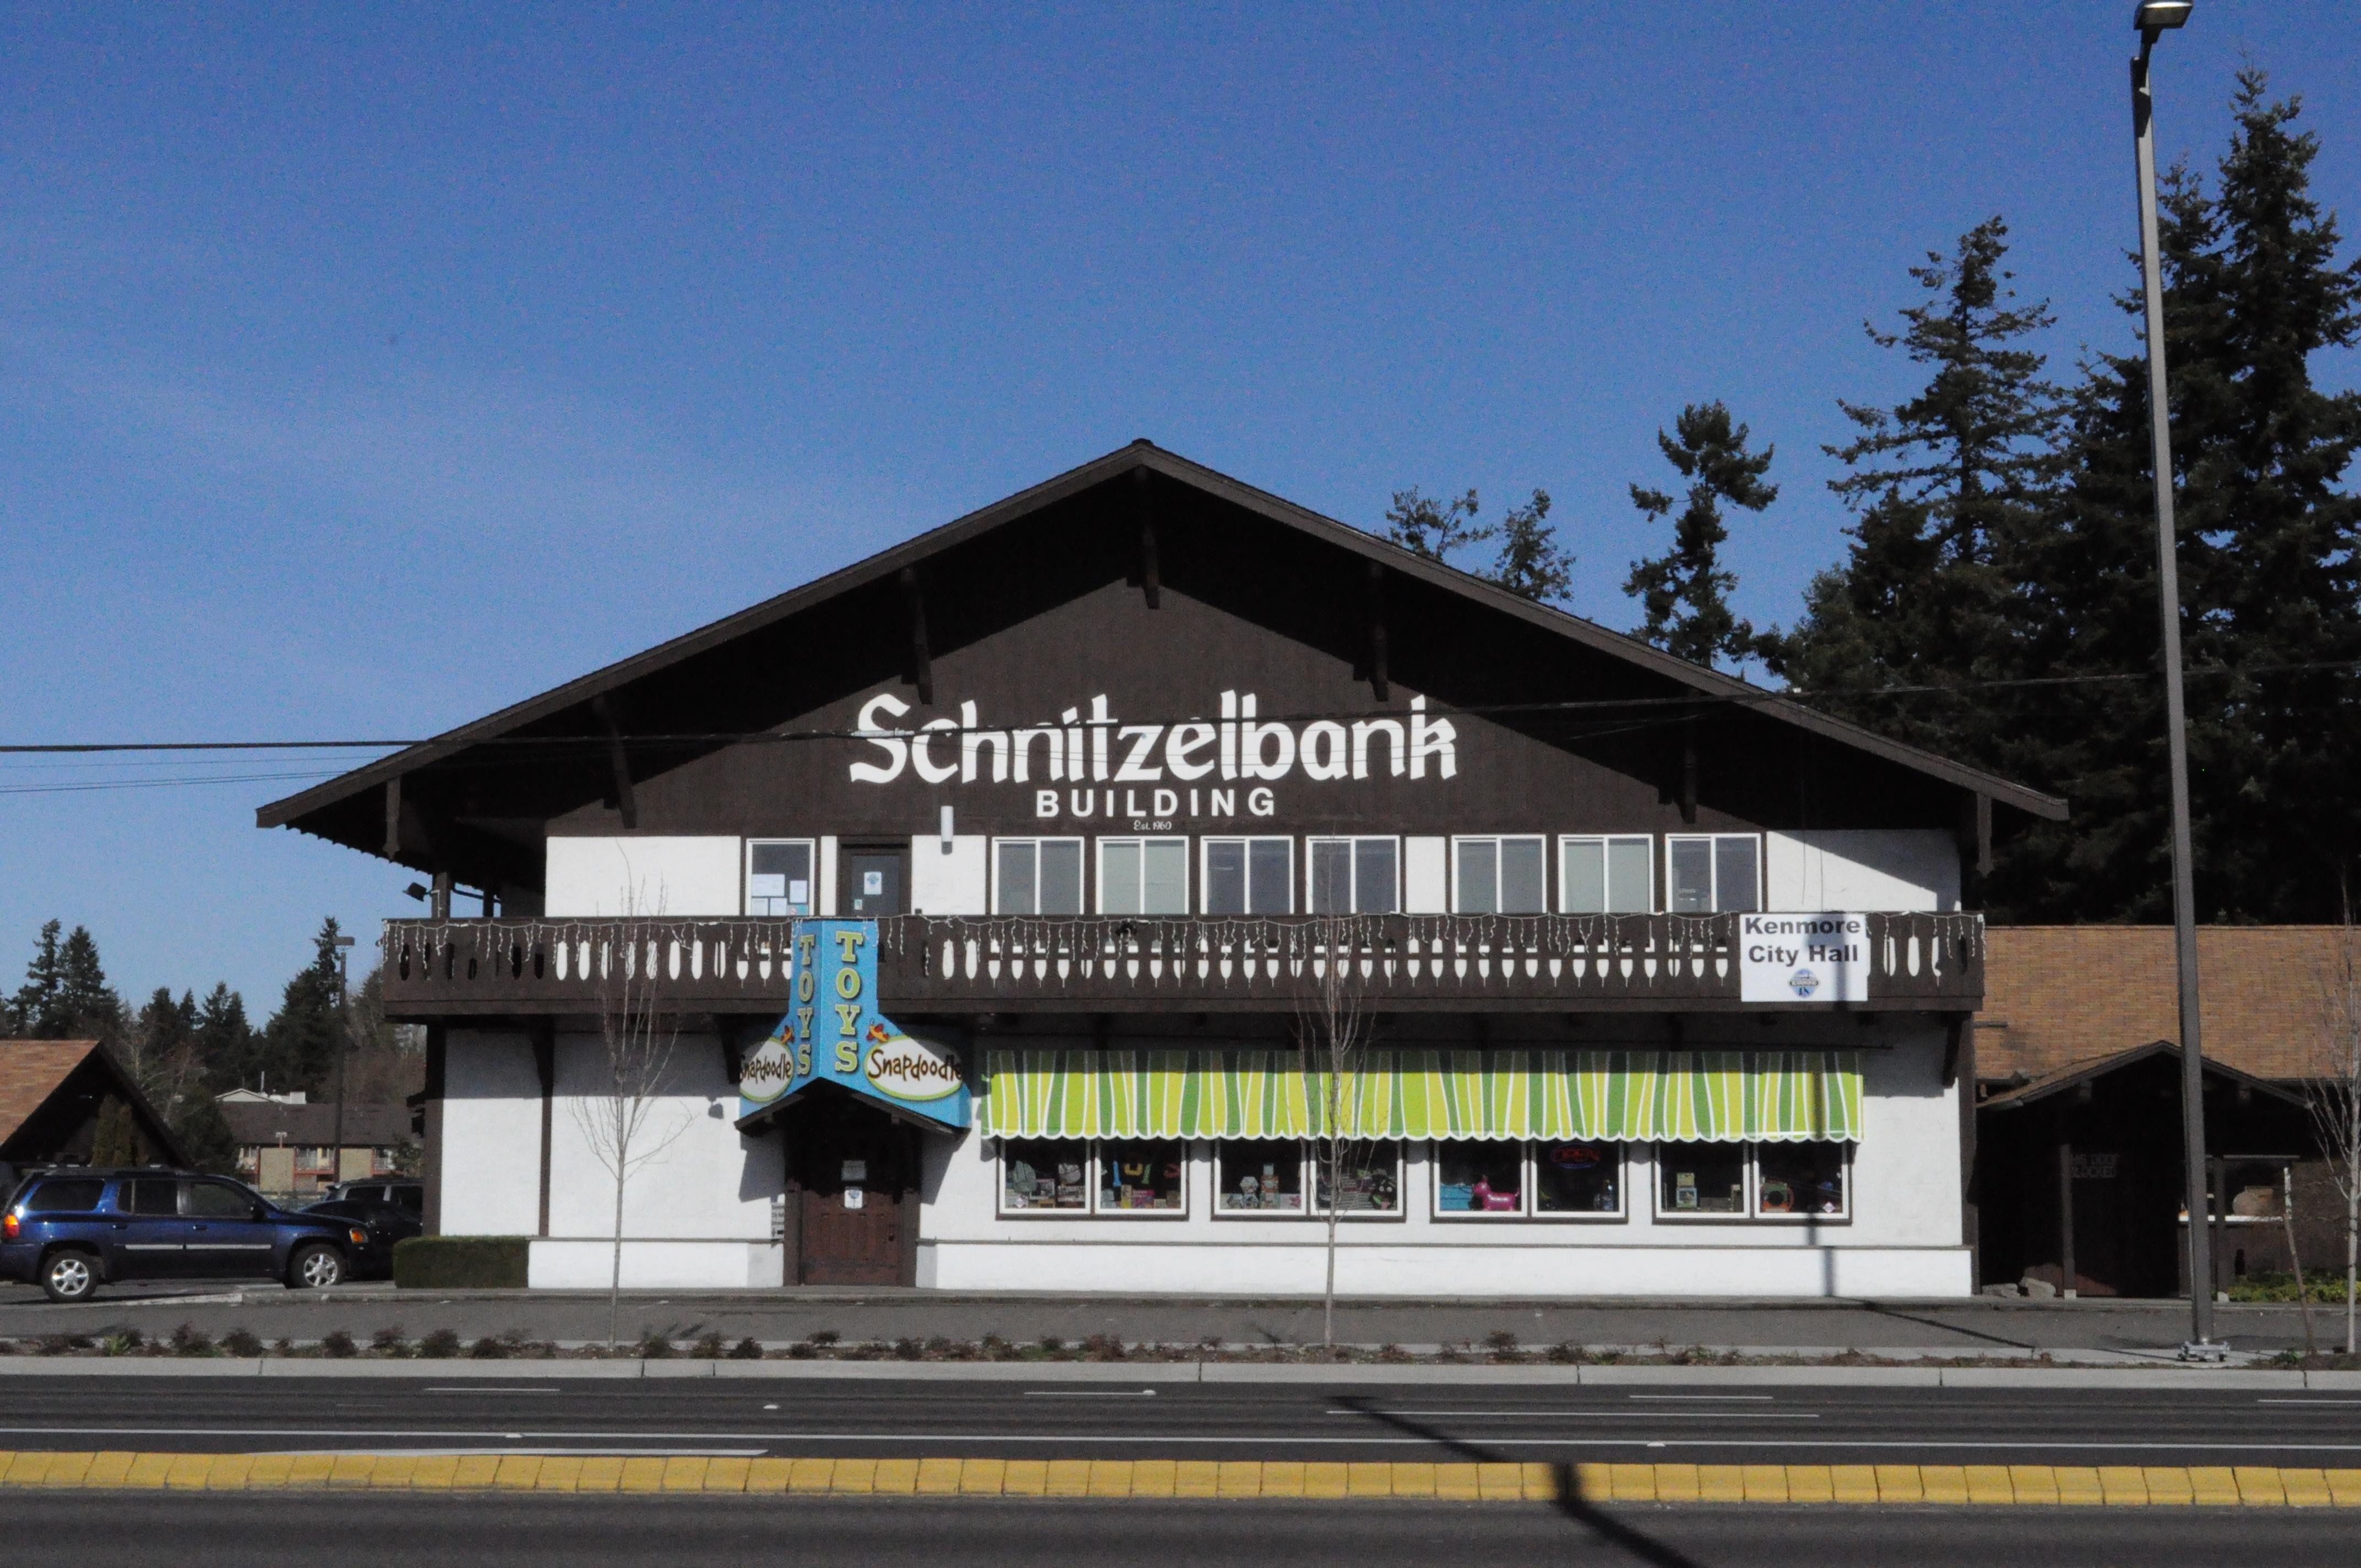 File:Kenmore, WA - Schnitzelbank Building 01.jpg - Wikimedia Commons